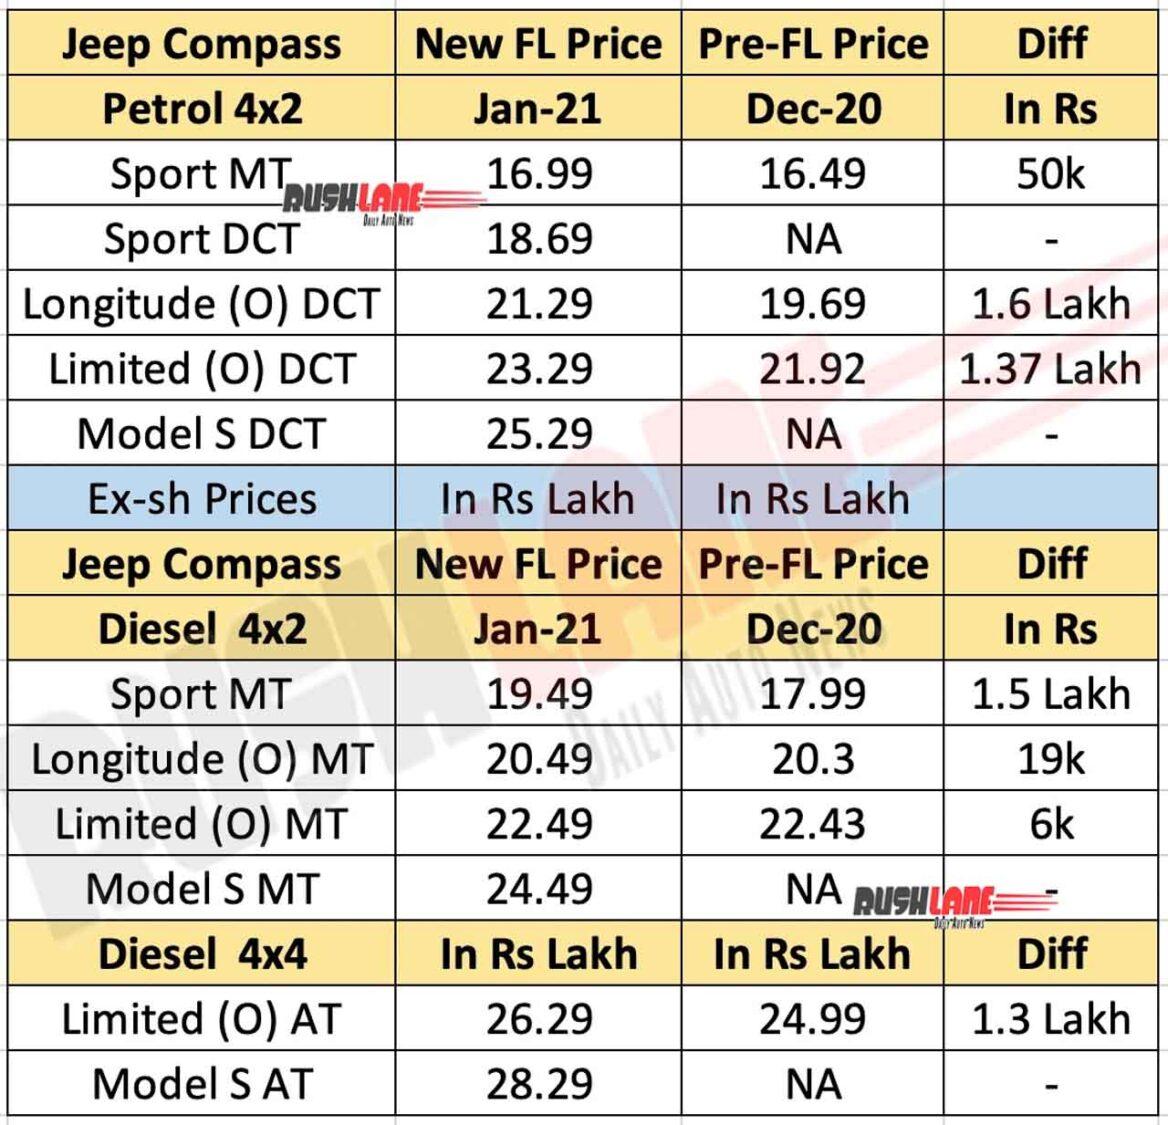 2021 Jeep Compass Price List